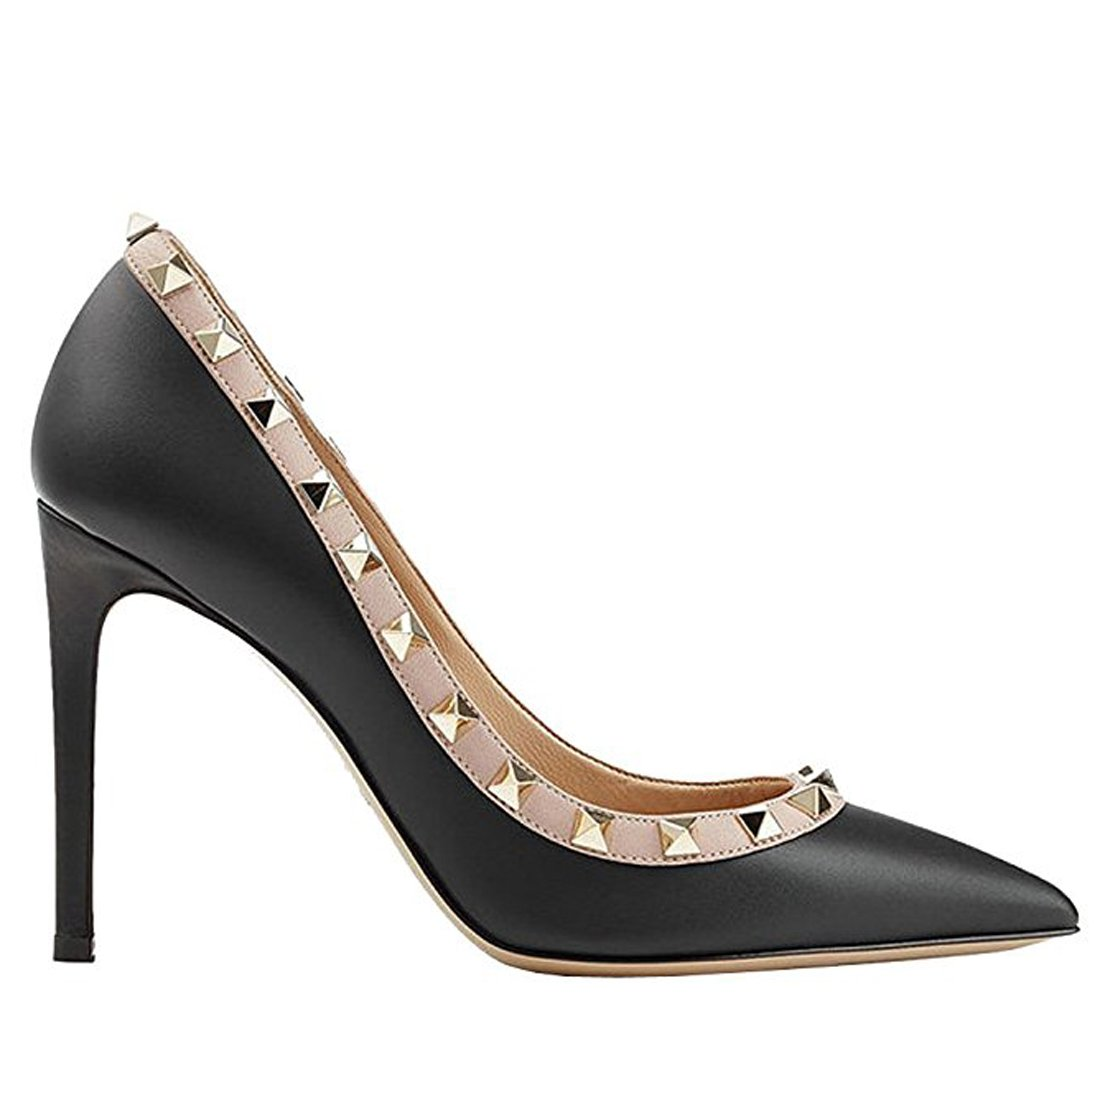 Chris-T Women's Studded Stiletto High Heels Rivets Shoes Pointed Toe Slip On Pumps 5-14 US B076FD46QS 8 B(M) US|Black Matte